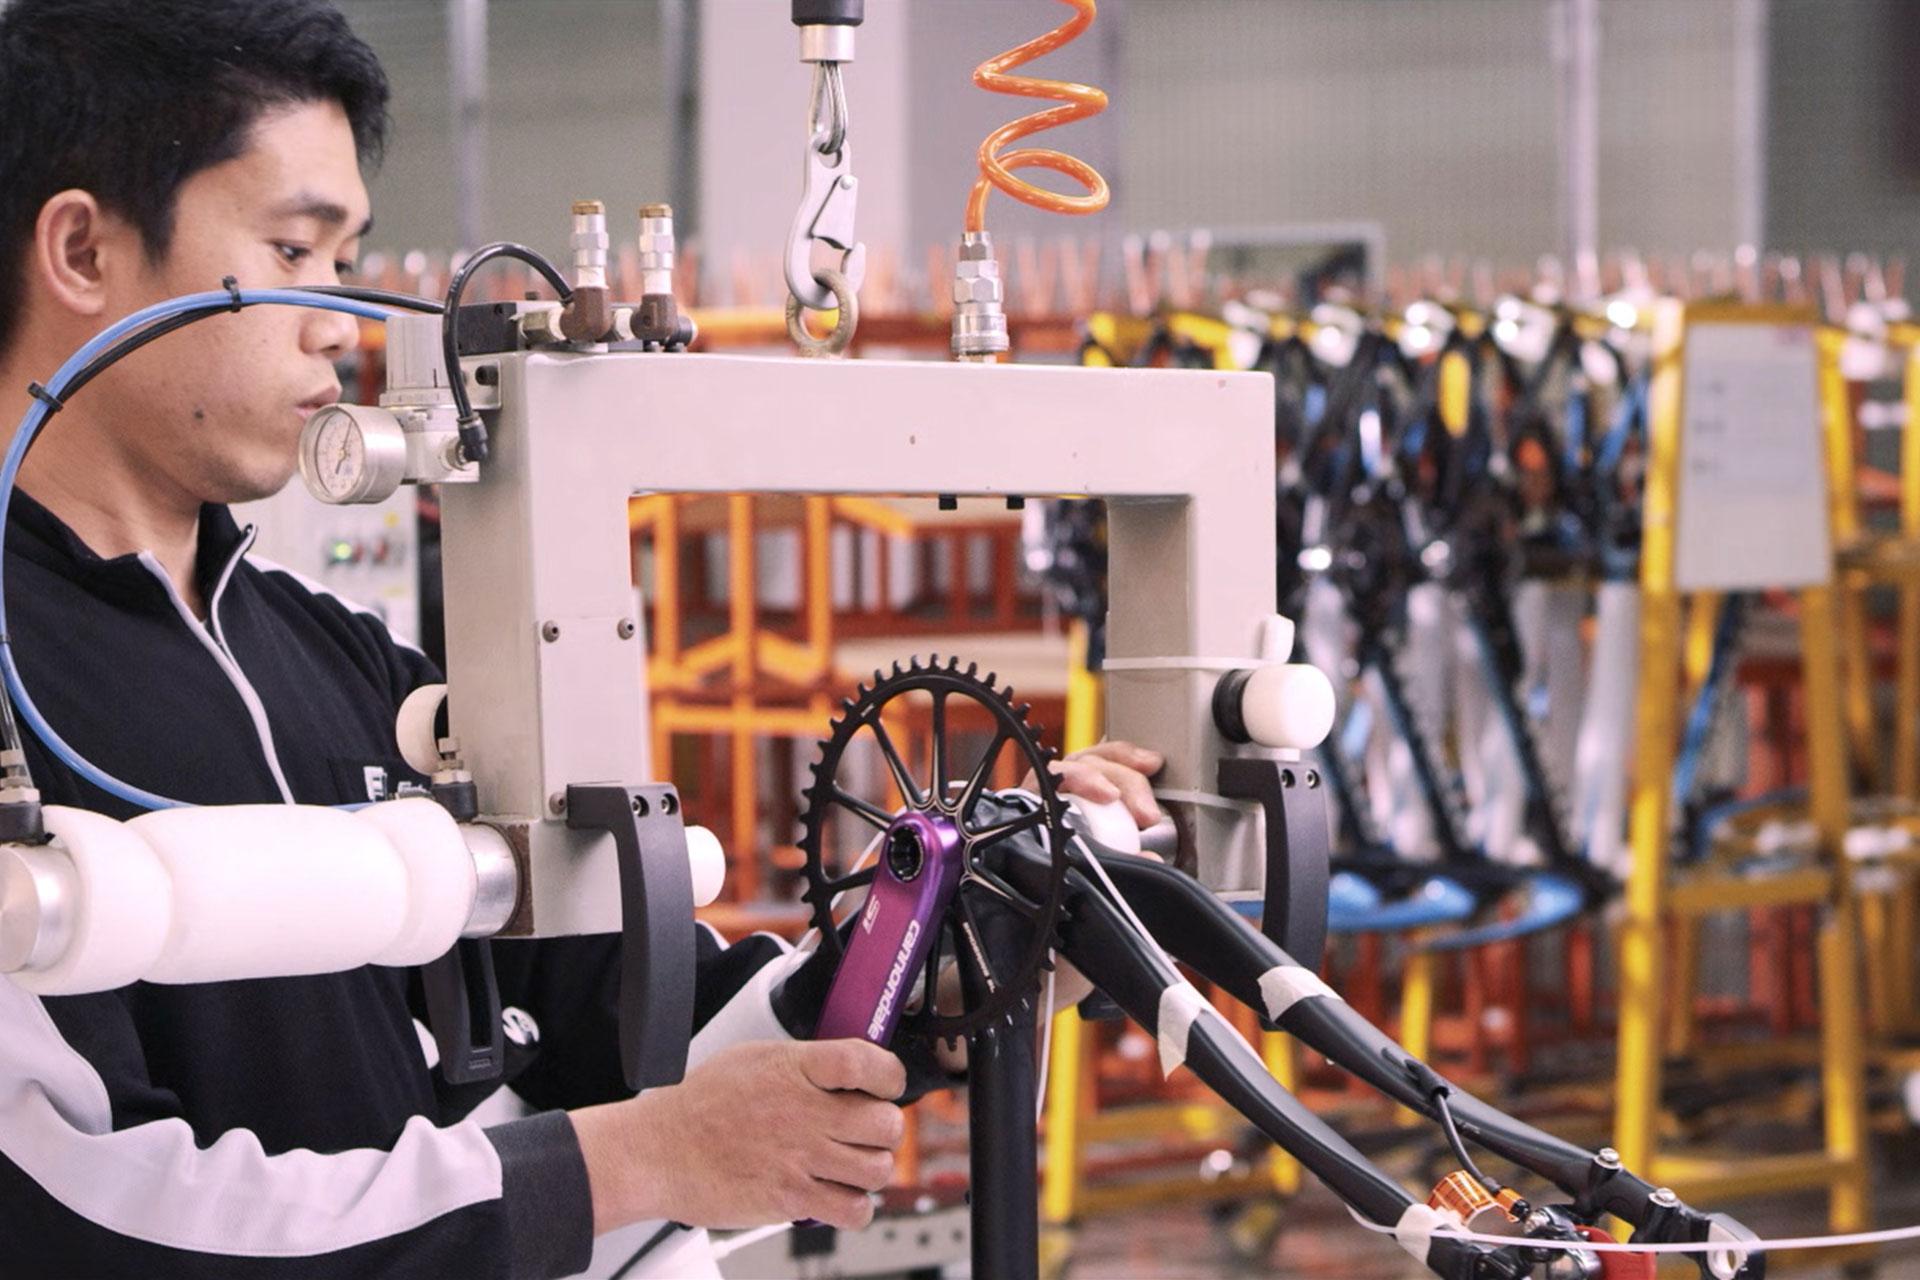 Fj Bike - Smart Bike Assembly Solutions - Rapid time to Market Taiwan